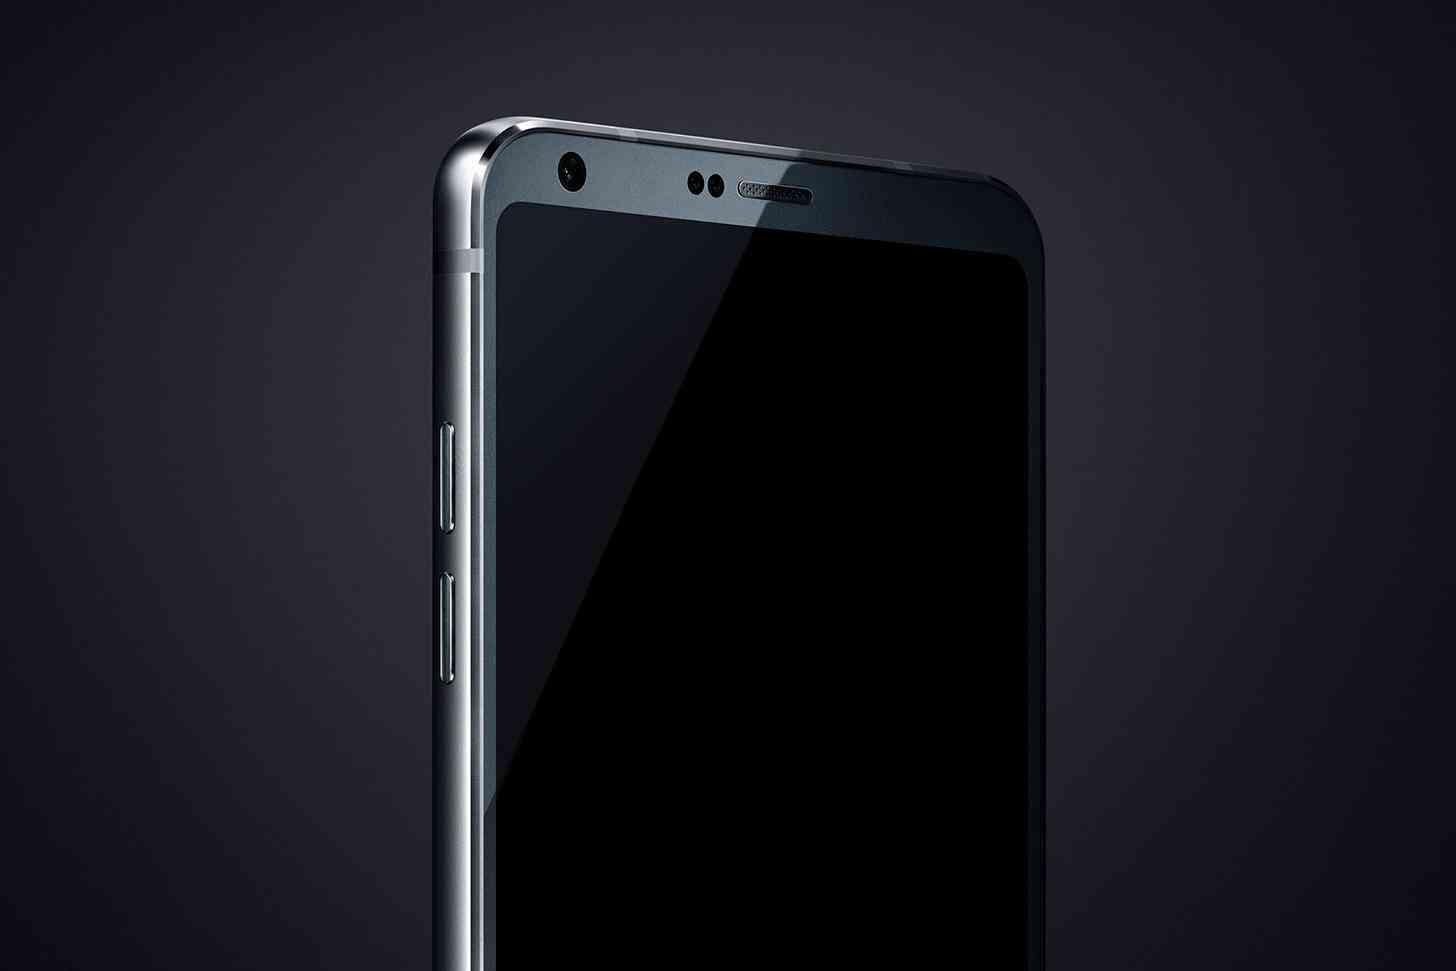 LG G6 front image leak